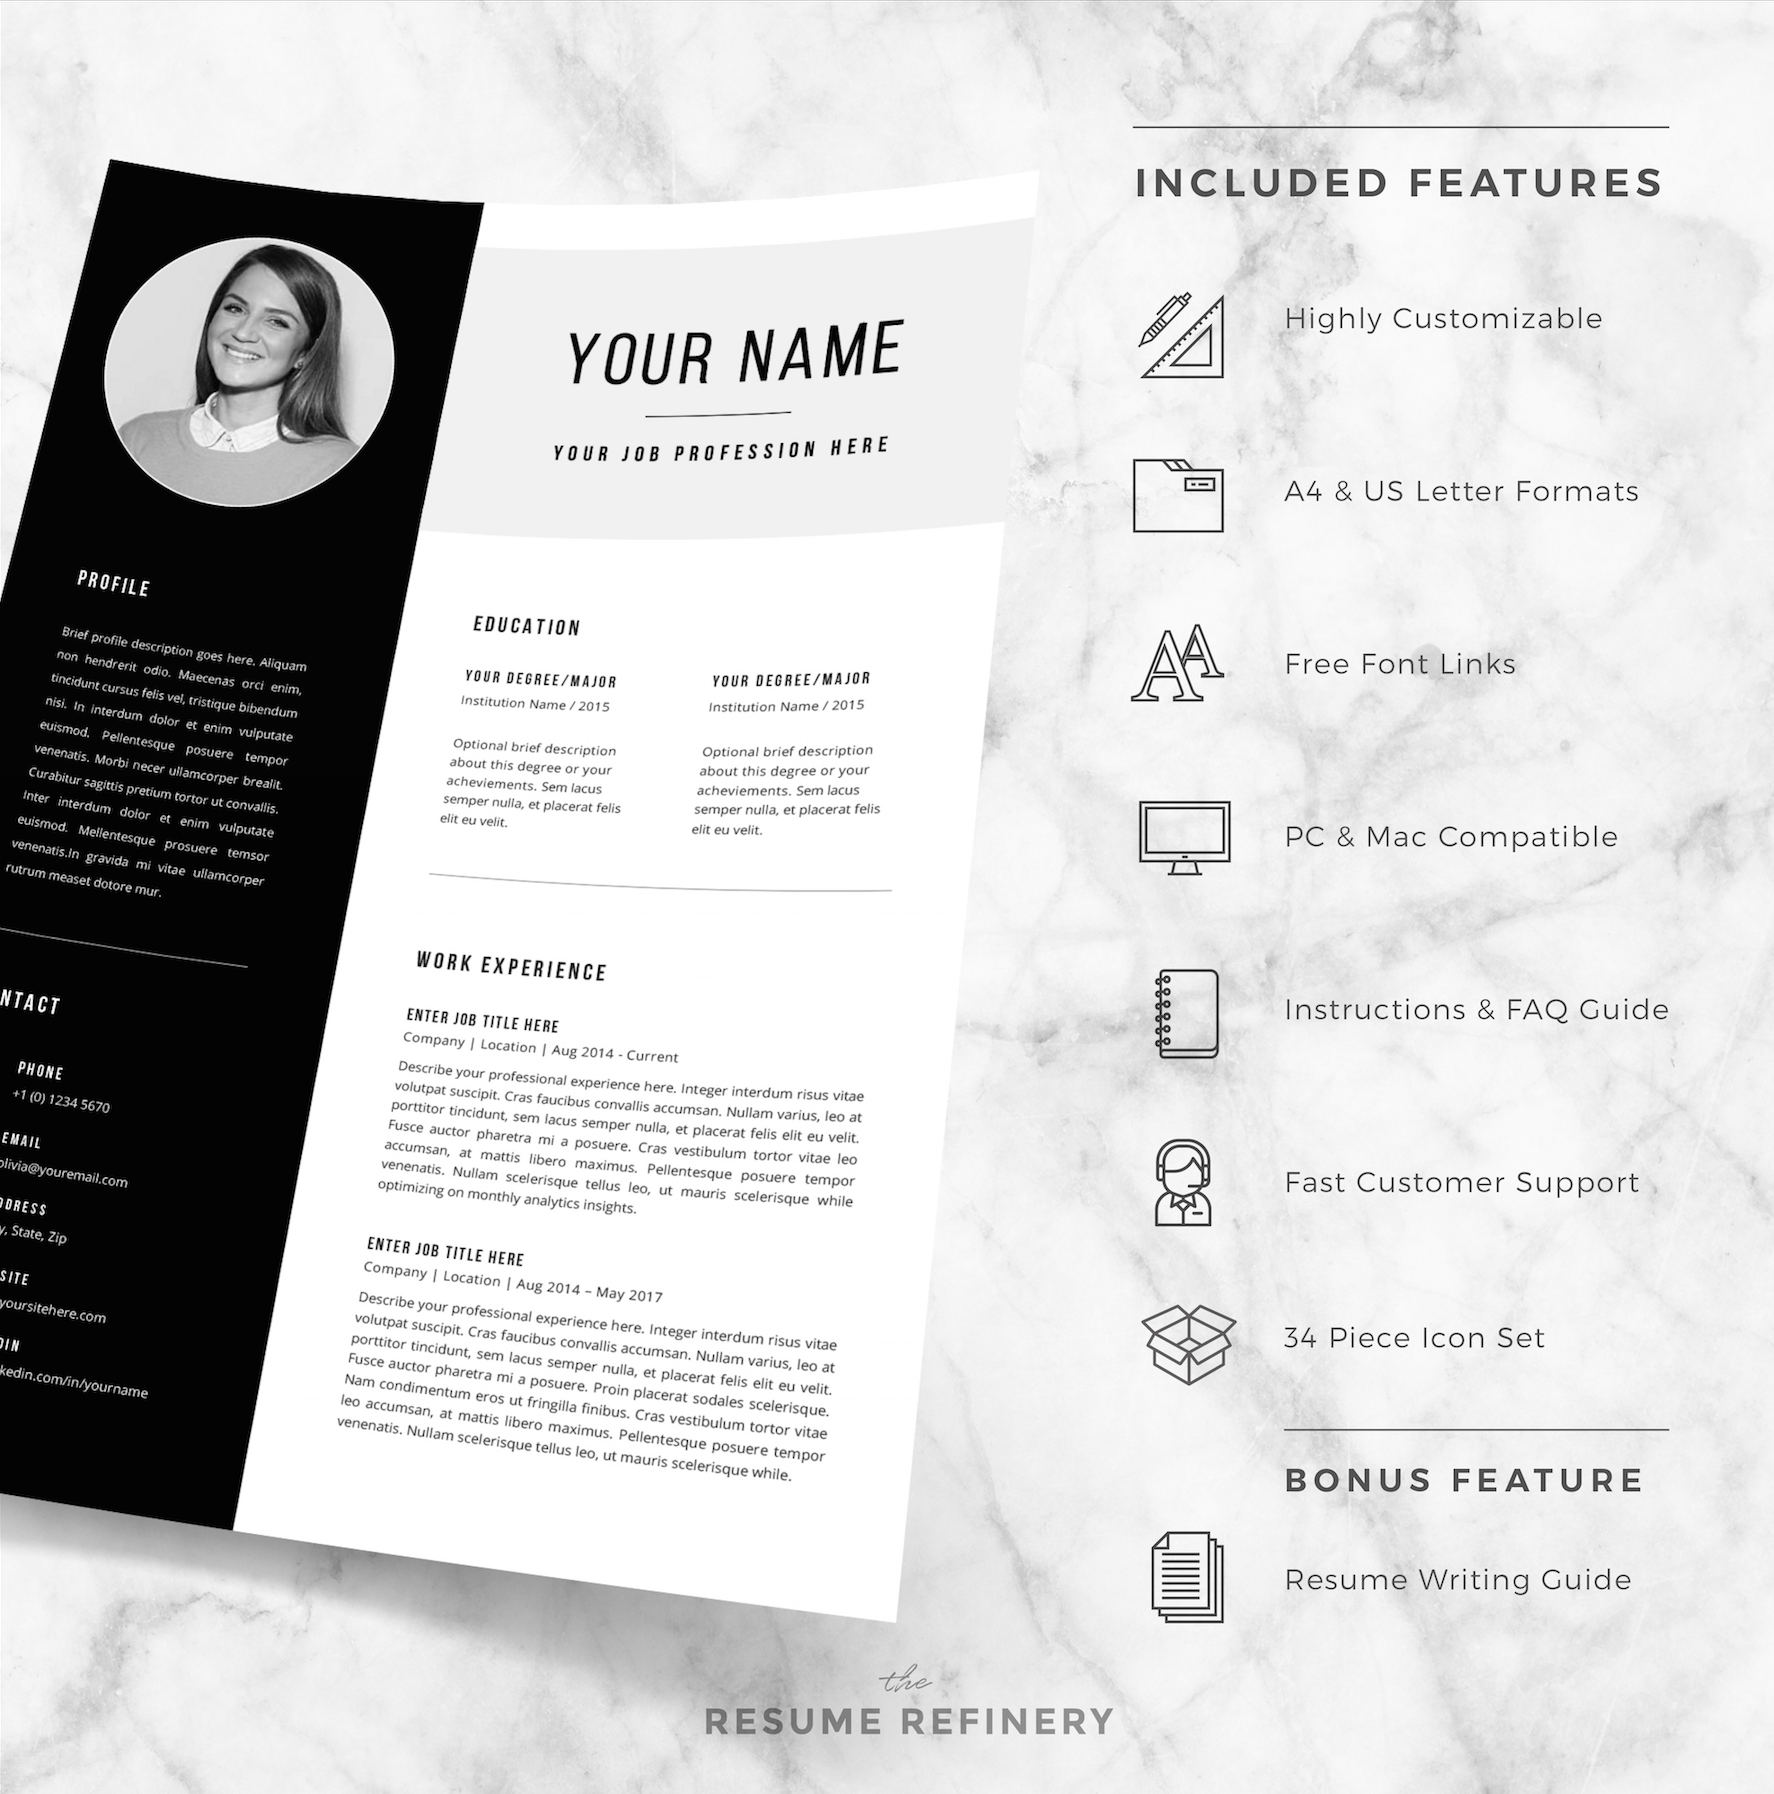 Bonus Letter Template Classy Modern 2 Page Resume  Cover Letter Template For Word  Bonus Resume .